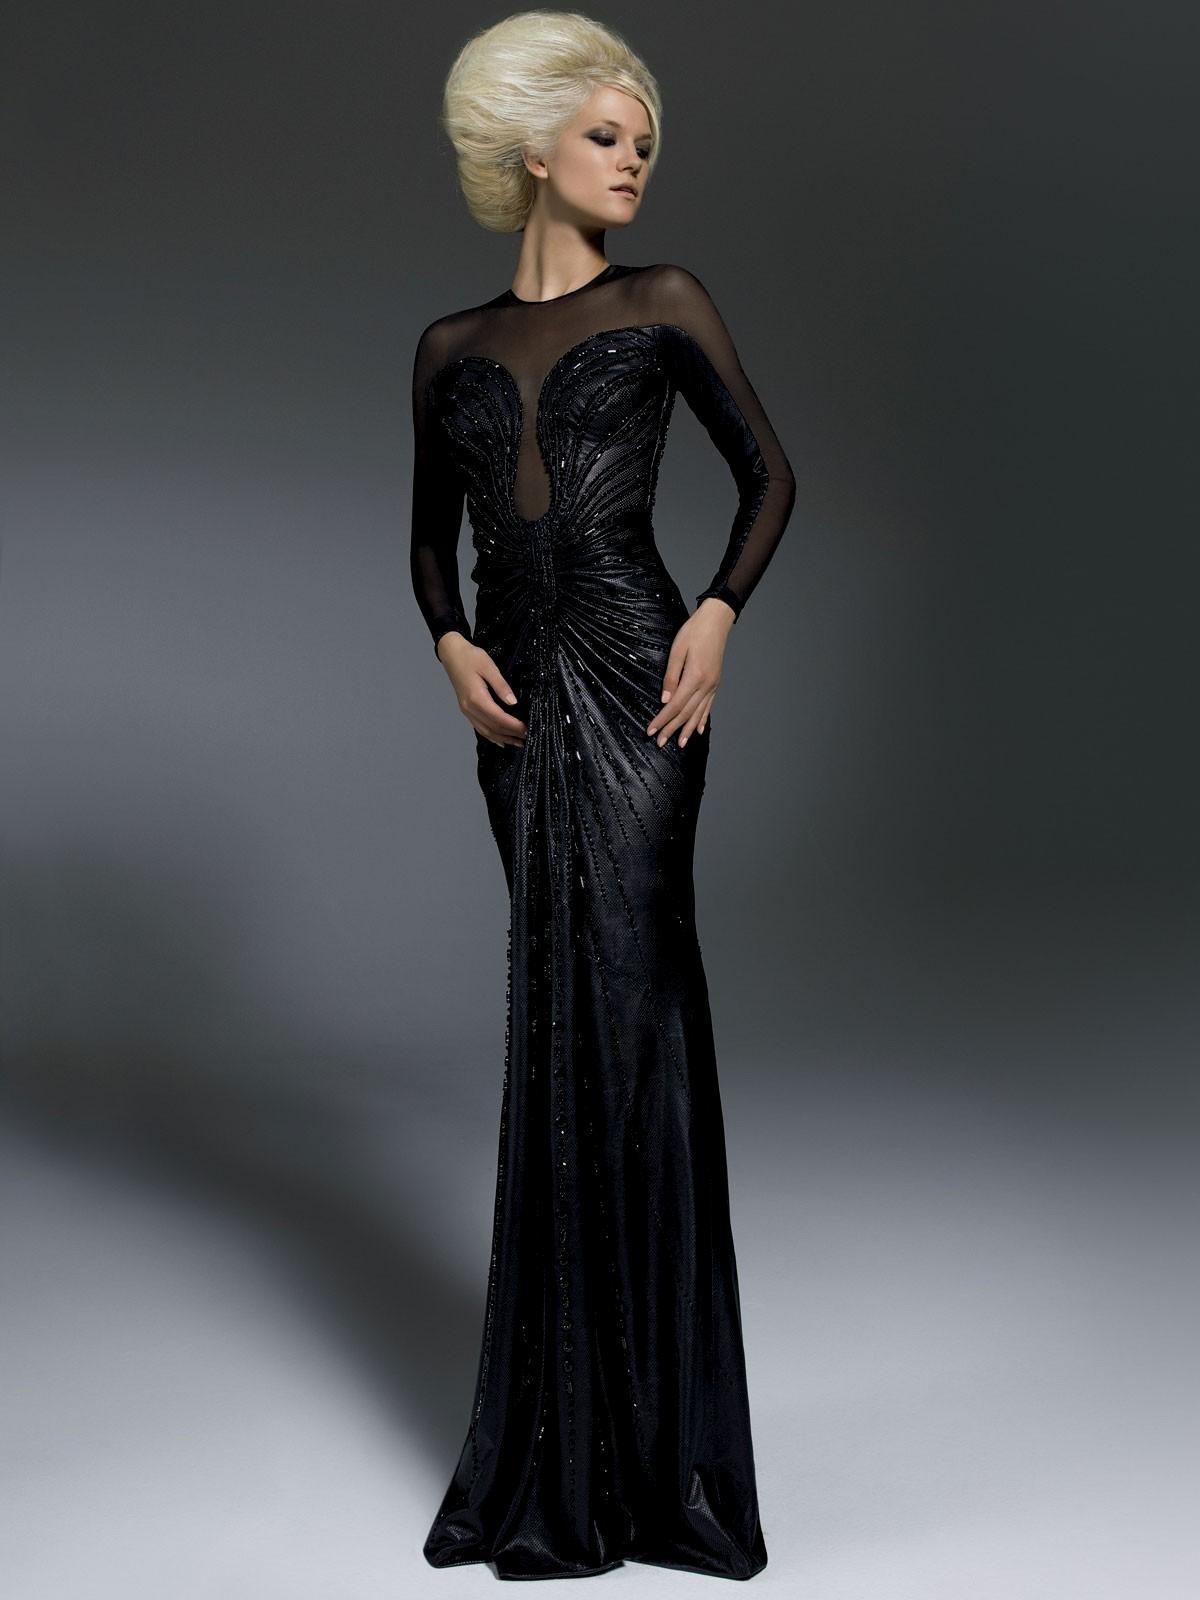 versace evening dresses photo - 1